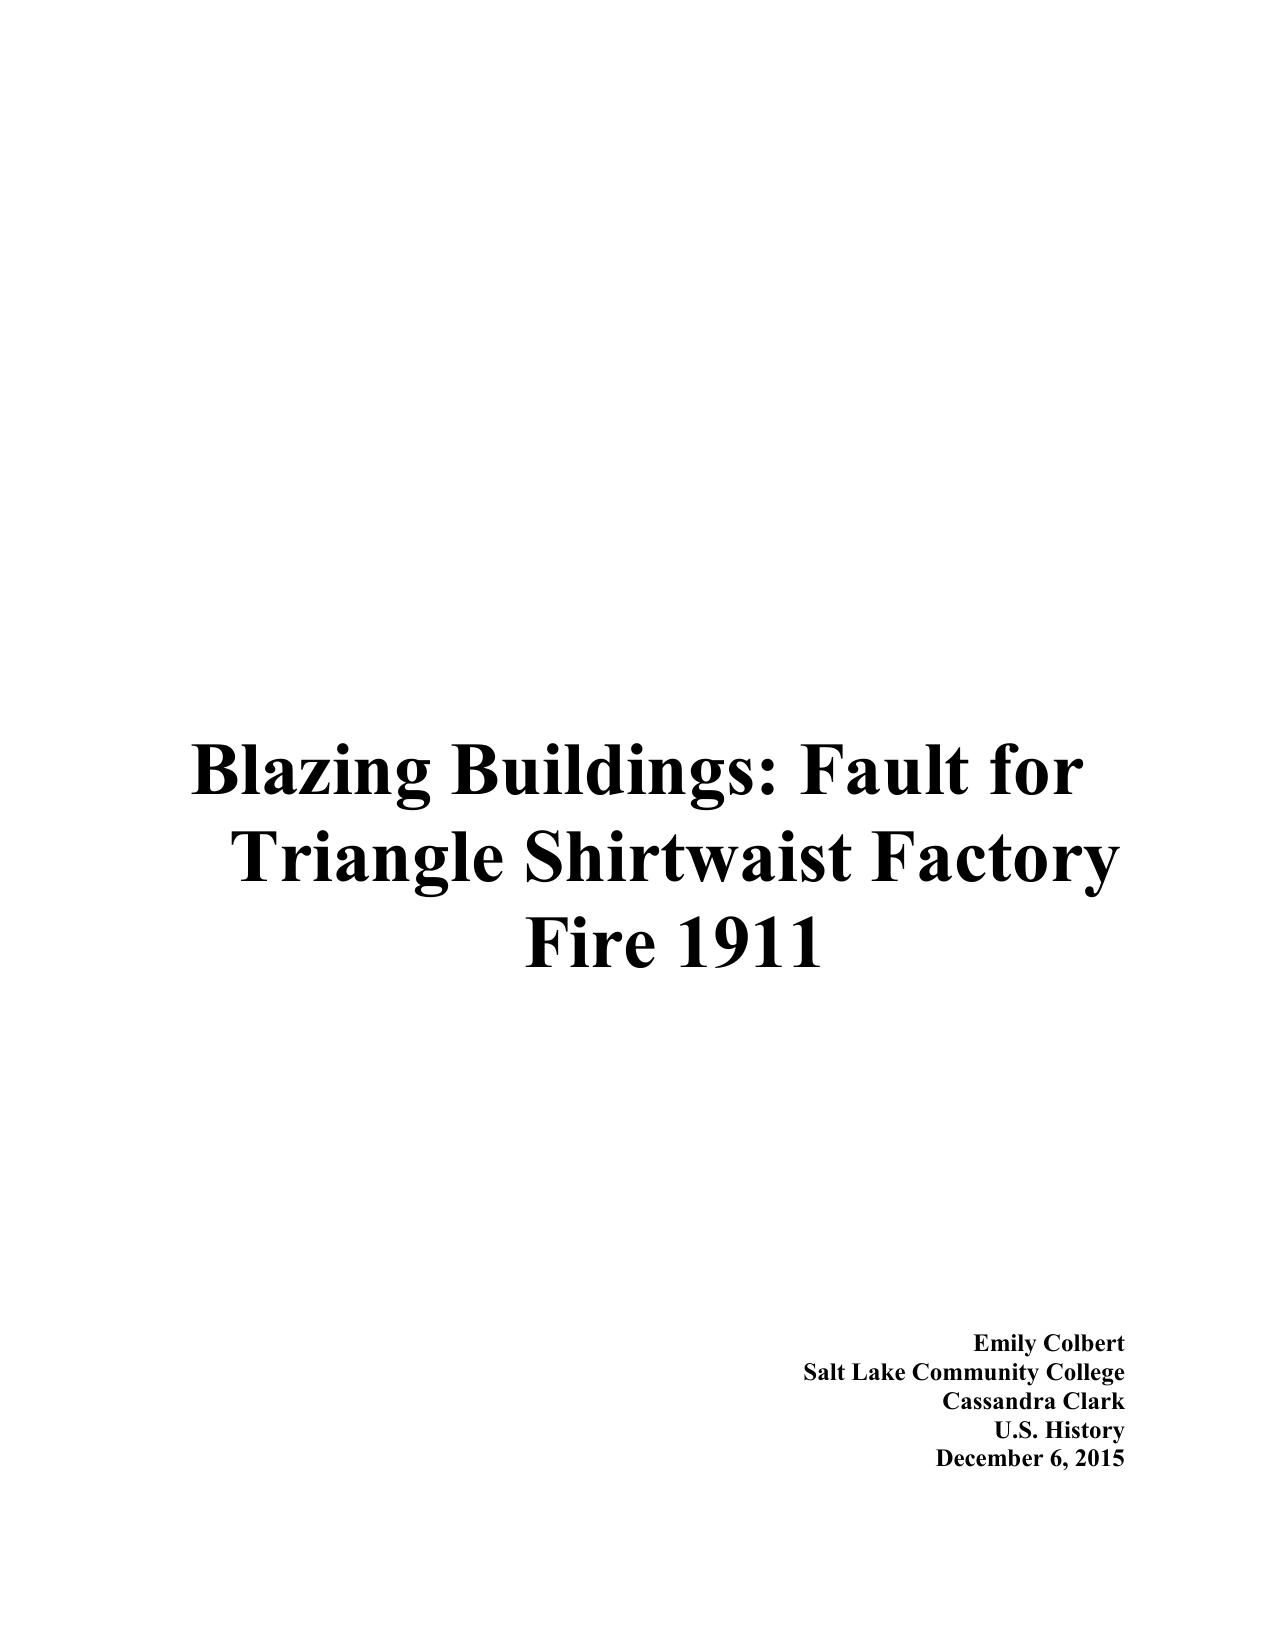 triangle shirtwaist factory fire research paper